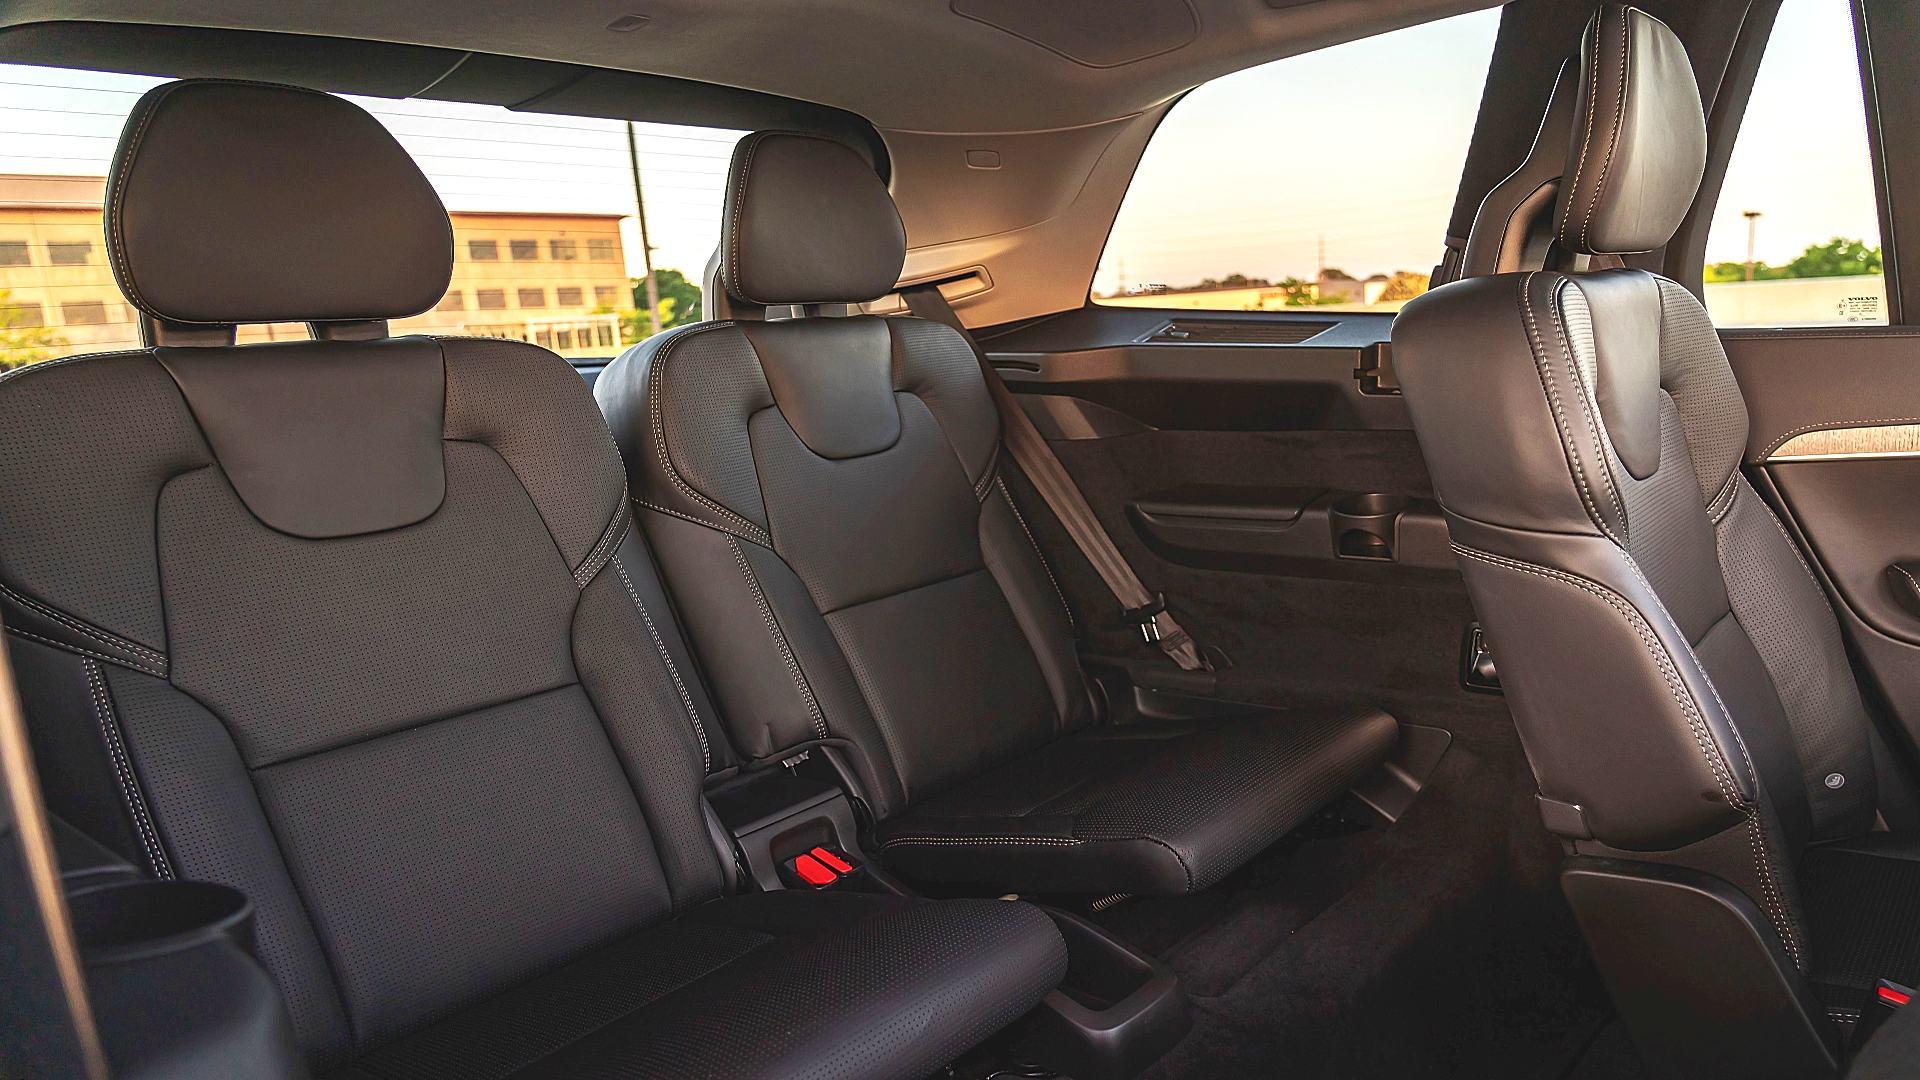 2020 Volvo XC90 SUV Interior